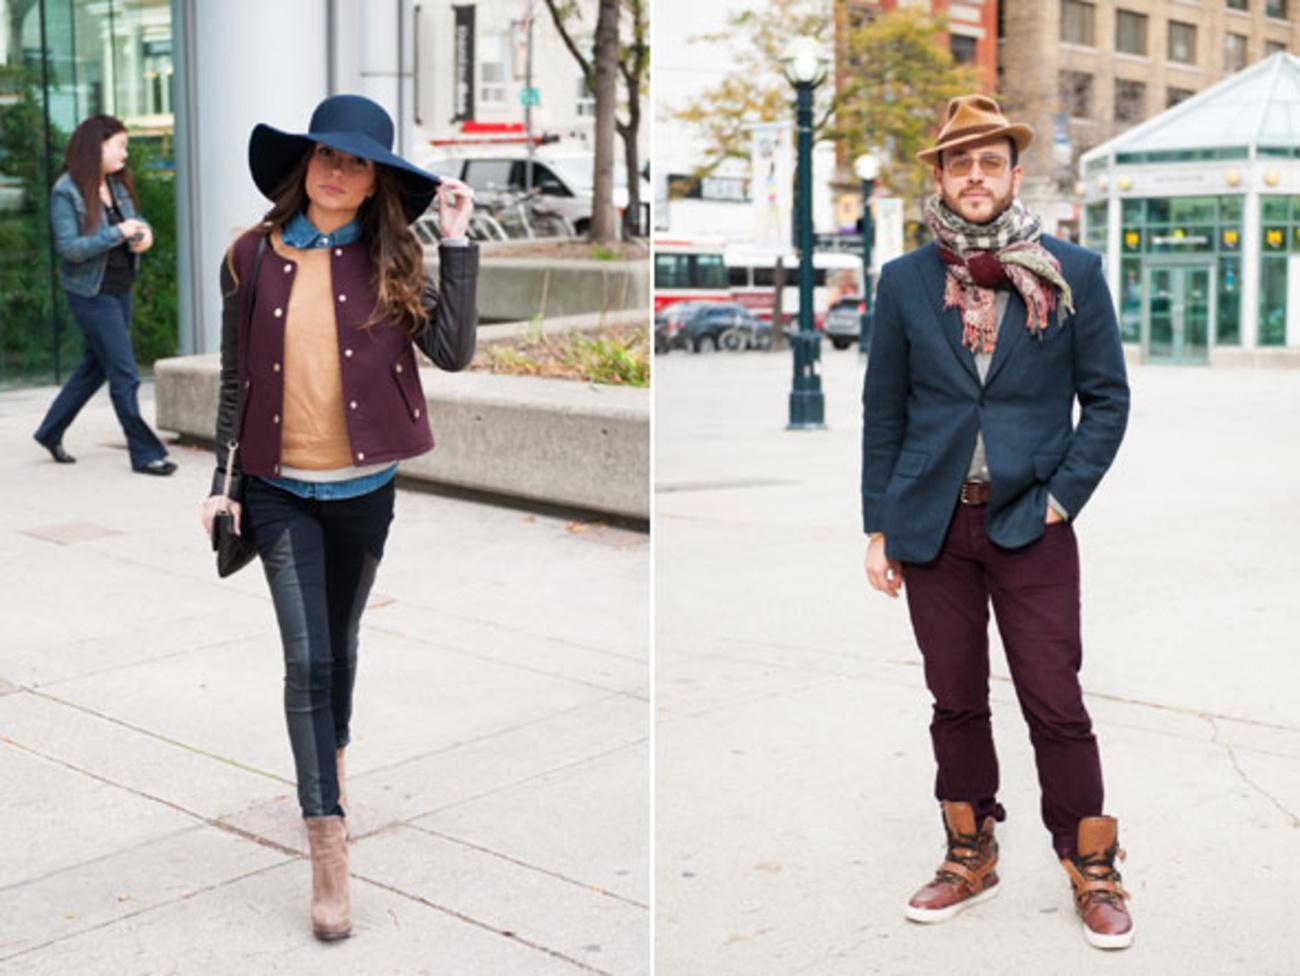 style hats galore at toronto fashion week